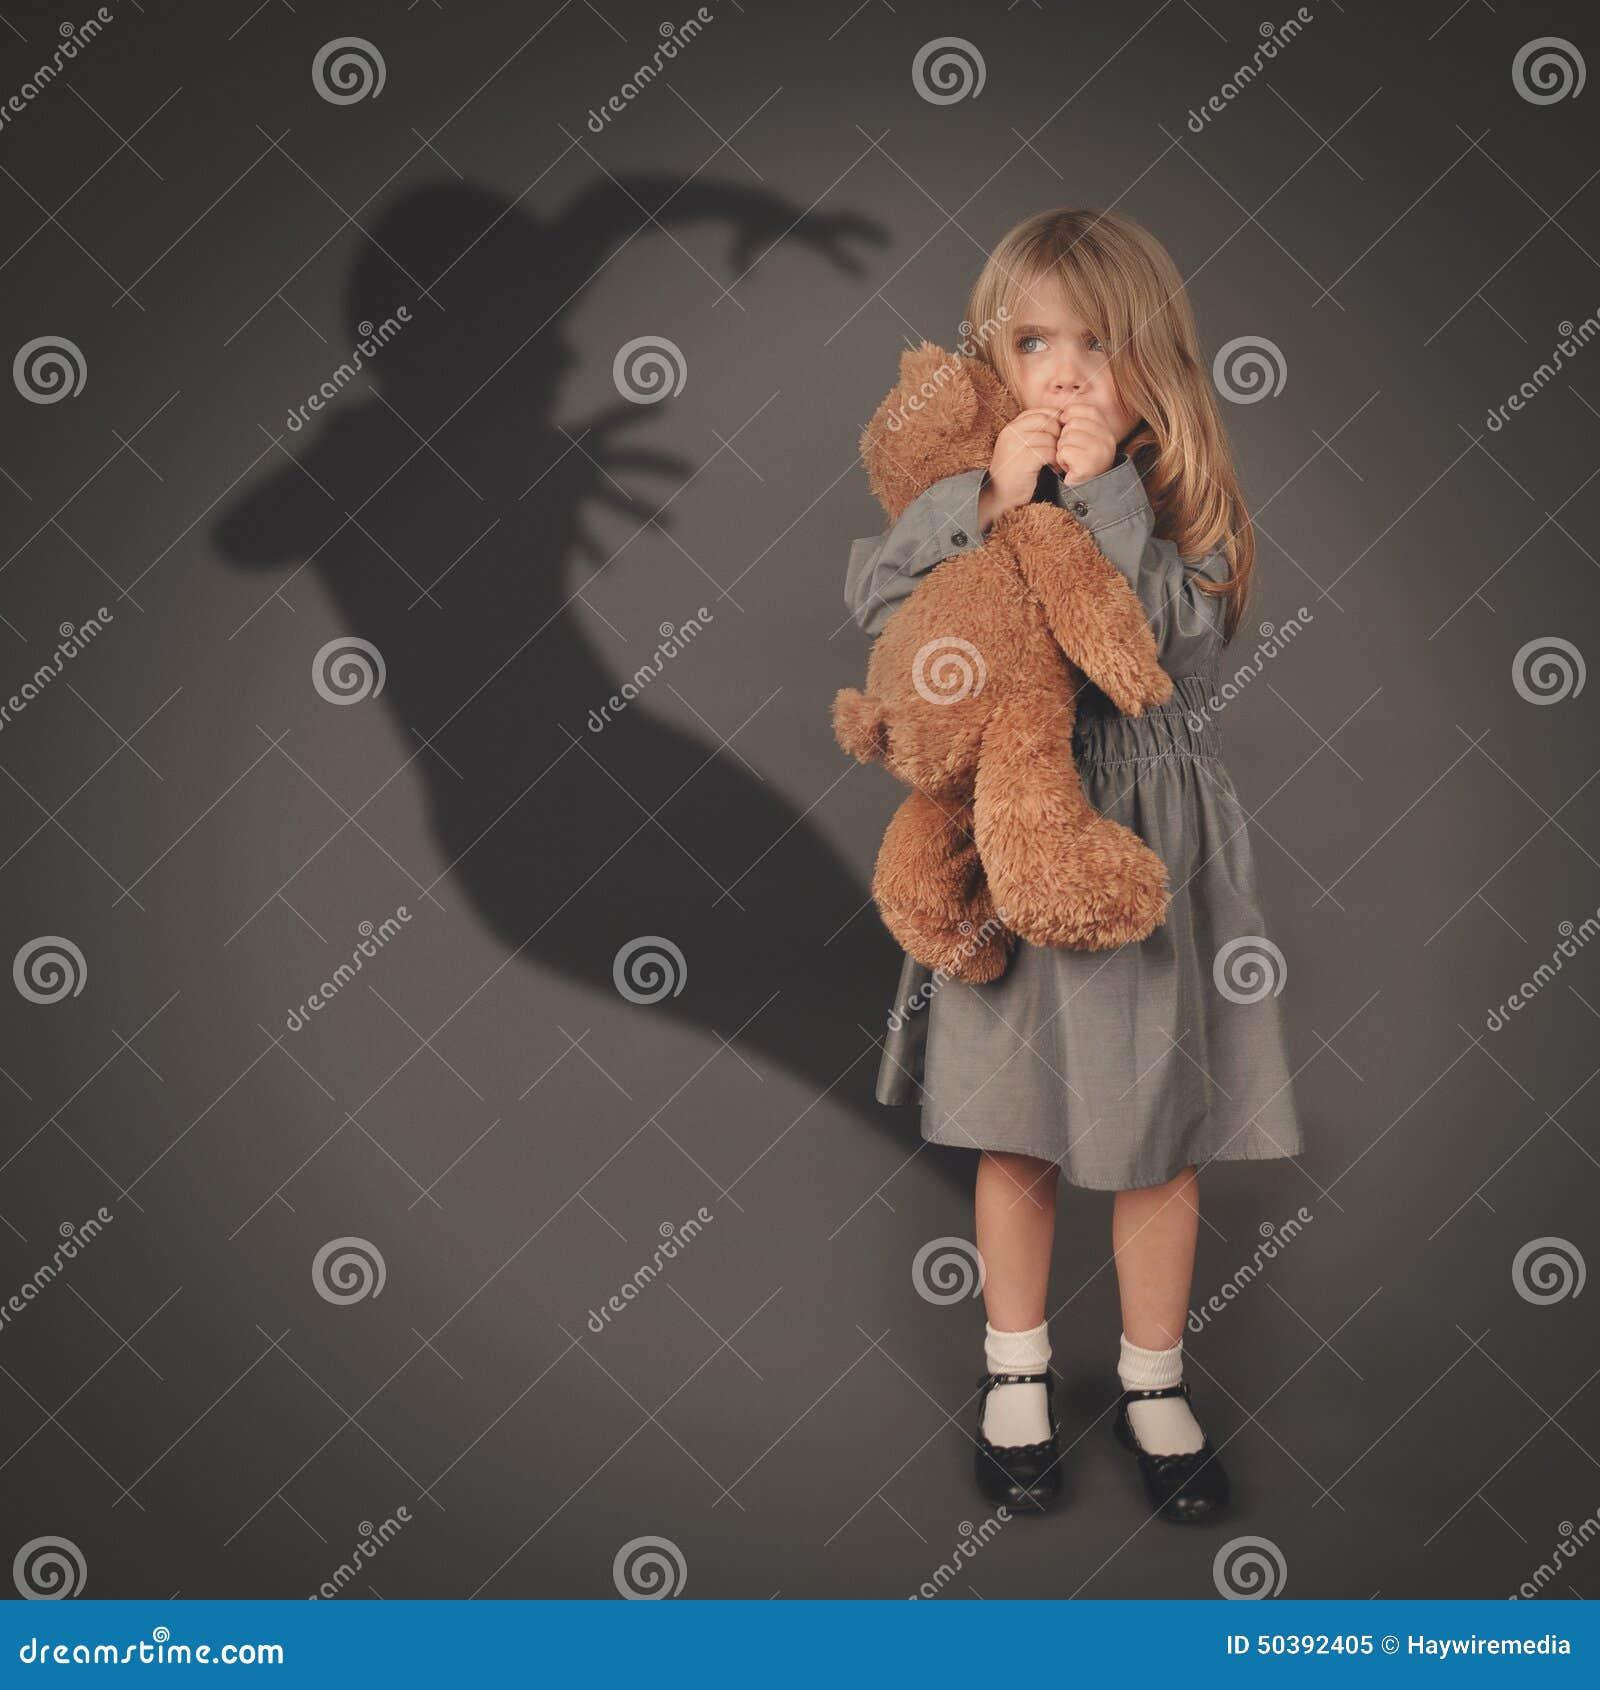 Scary Dark Silhouette Ghost Behind Little Child